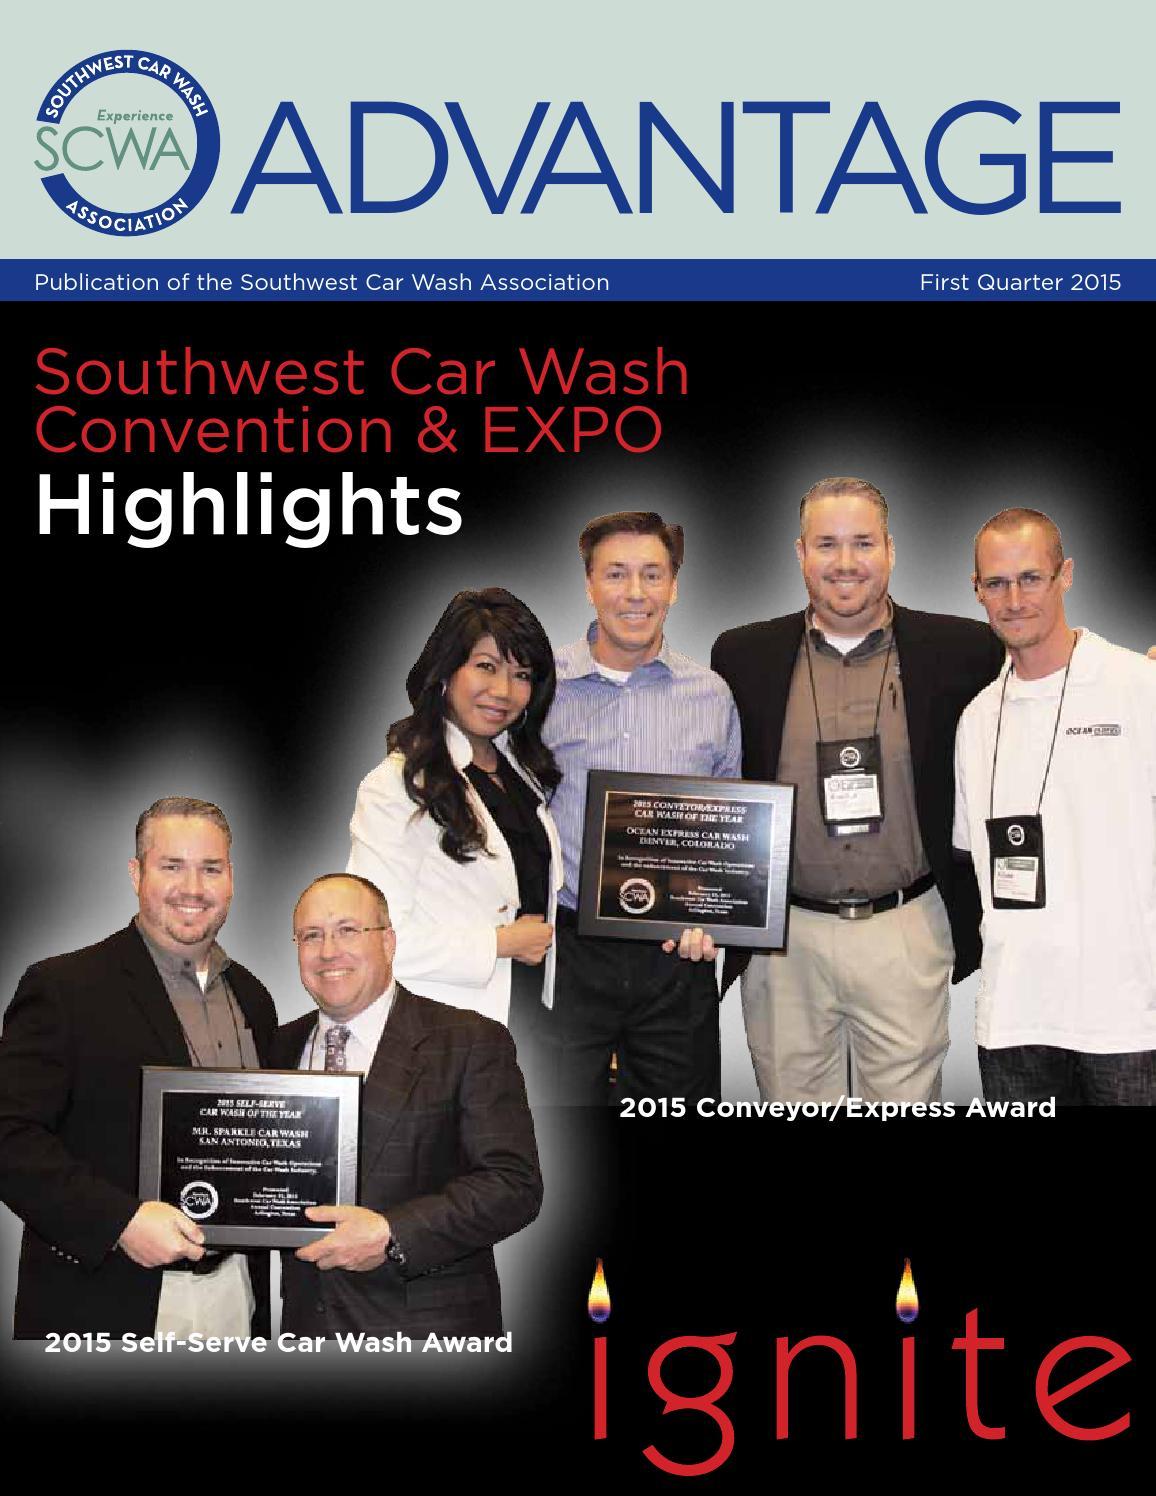 Southwest car wash association advantage first quarter 2015 by southwest car wash association advantage first quarter 2015 by southwest car wash association advantage issuu solutioingenieria Images